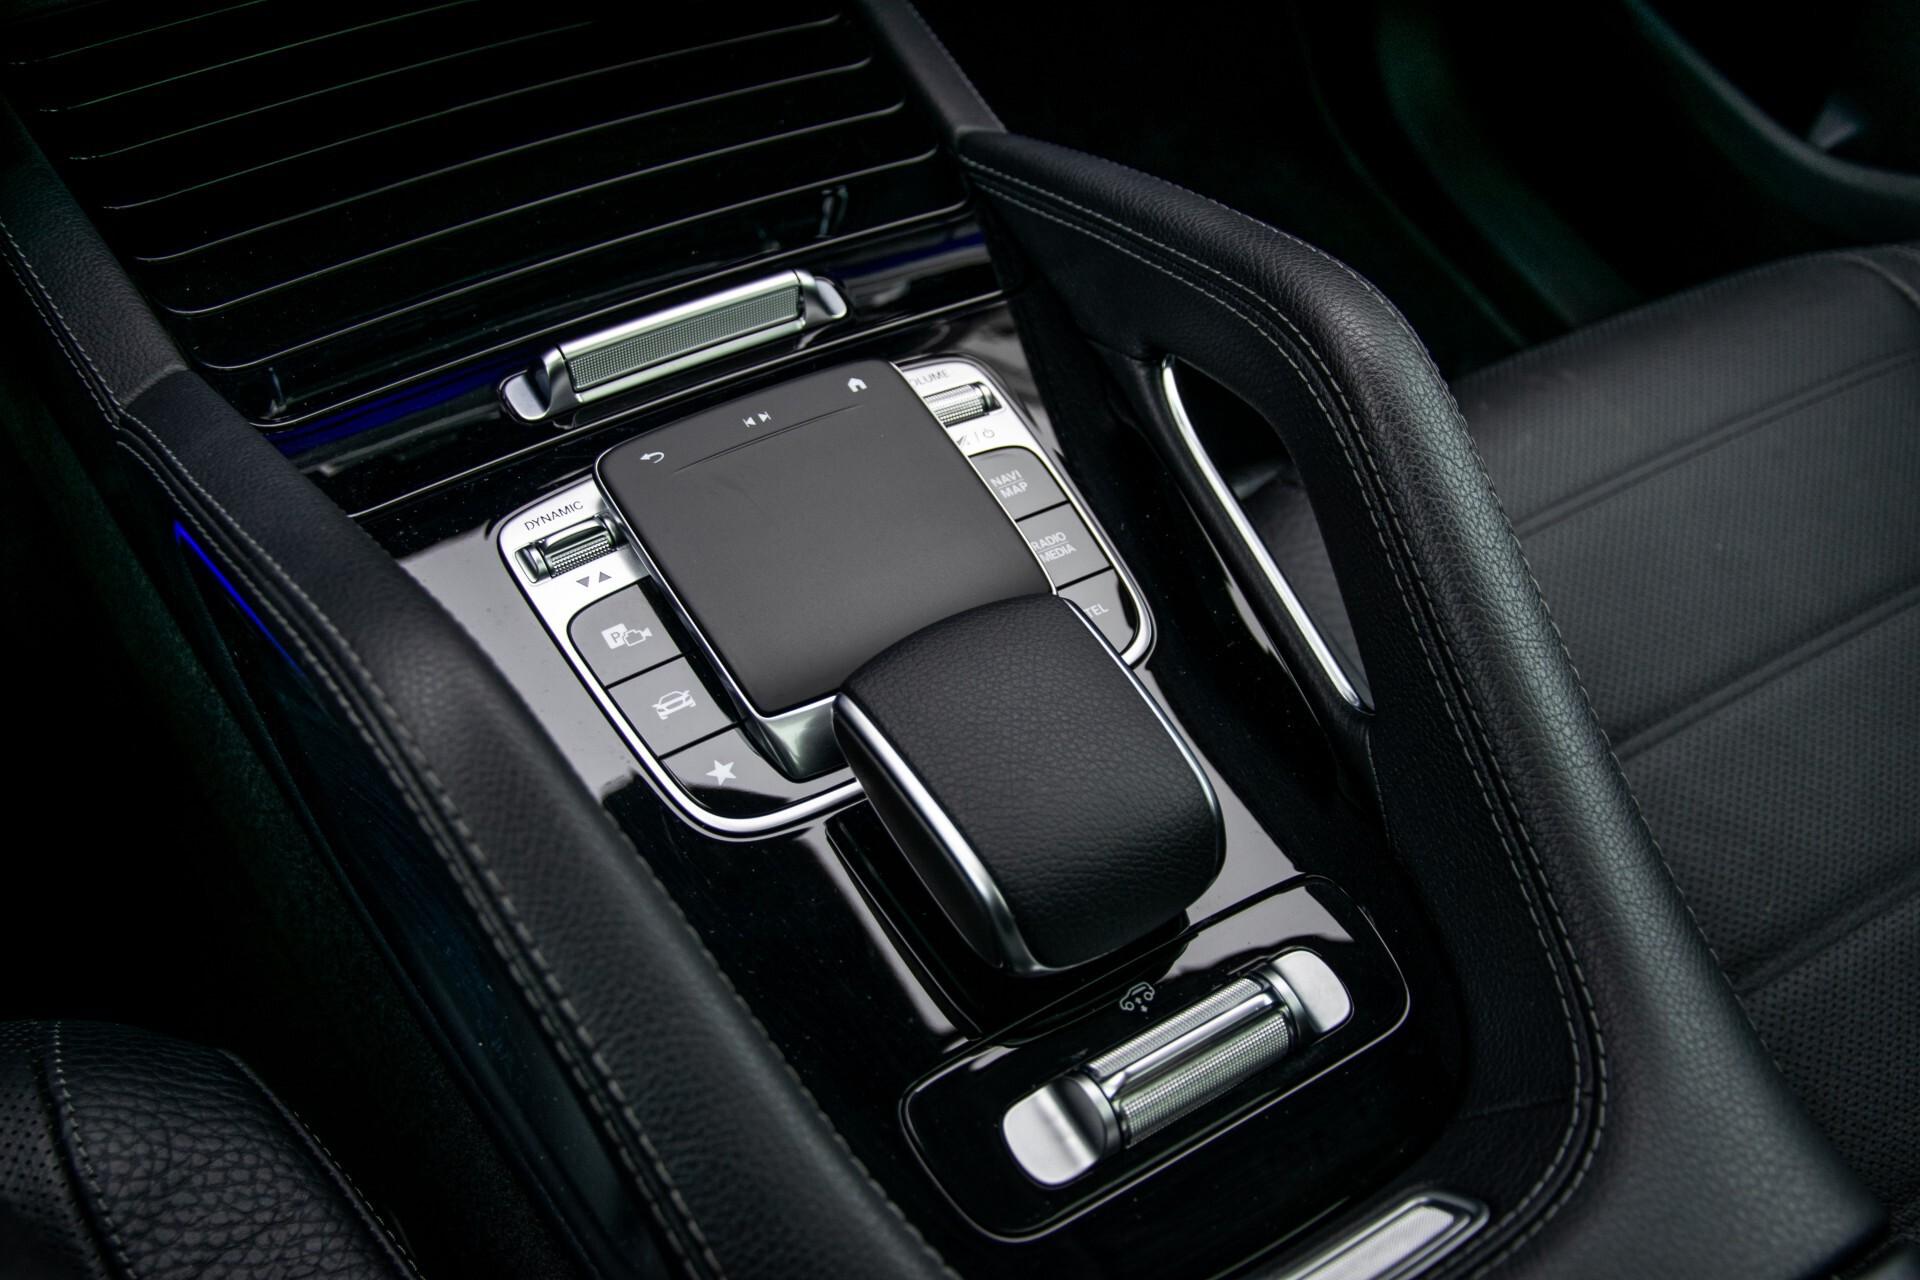 Mercedes-Benz GLE 450 4-M 7-Persoons AMG Massage/Rij-assist/Keyless/TV/360/Night/Trekhaak Aut9 Foto 58